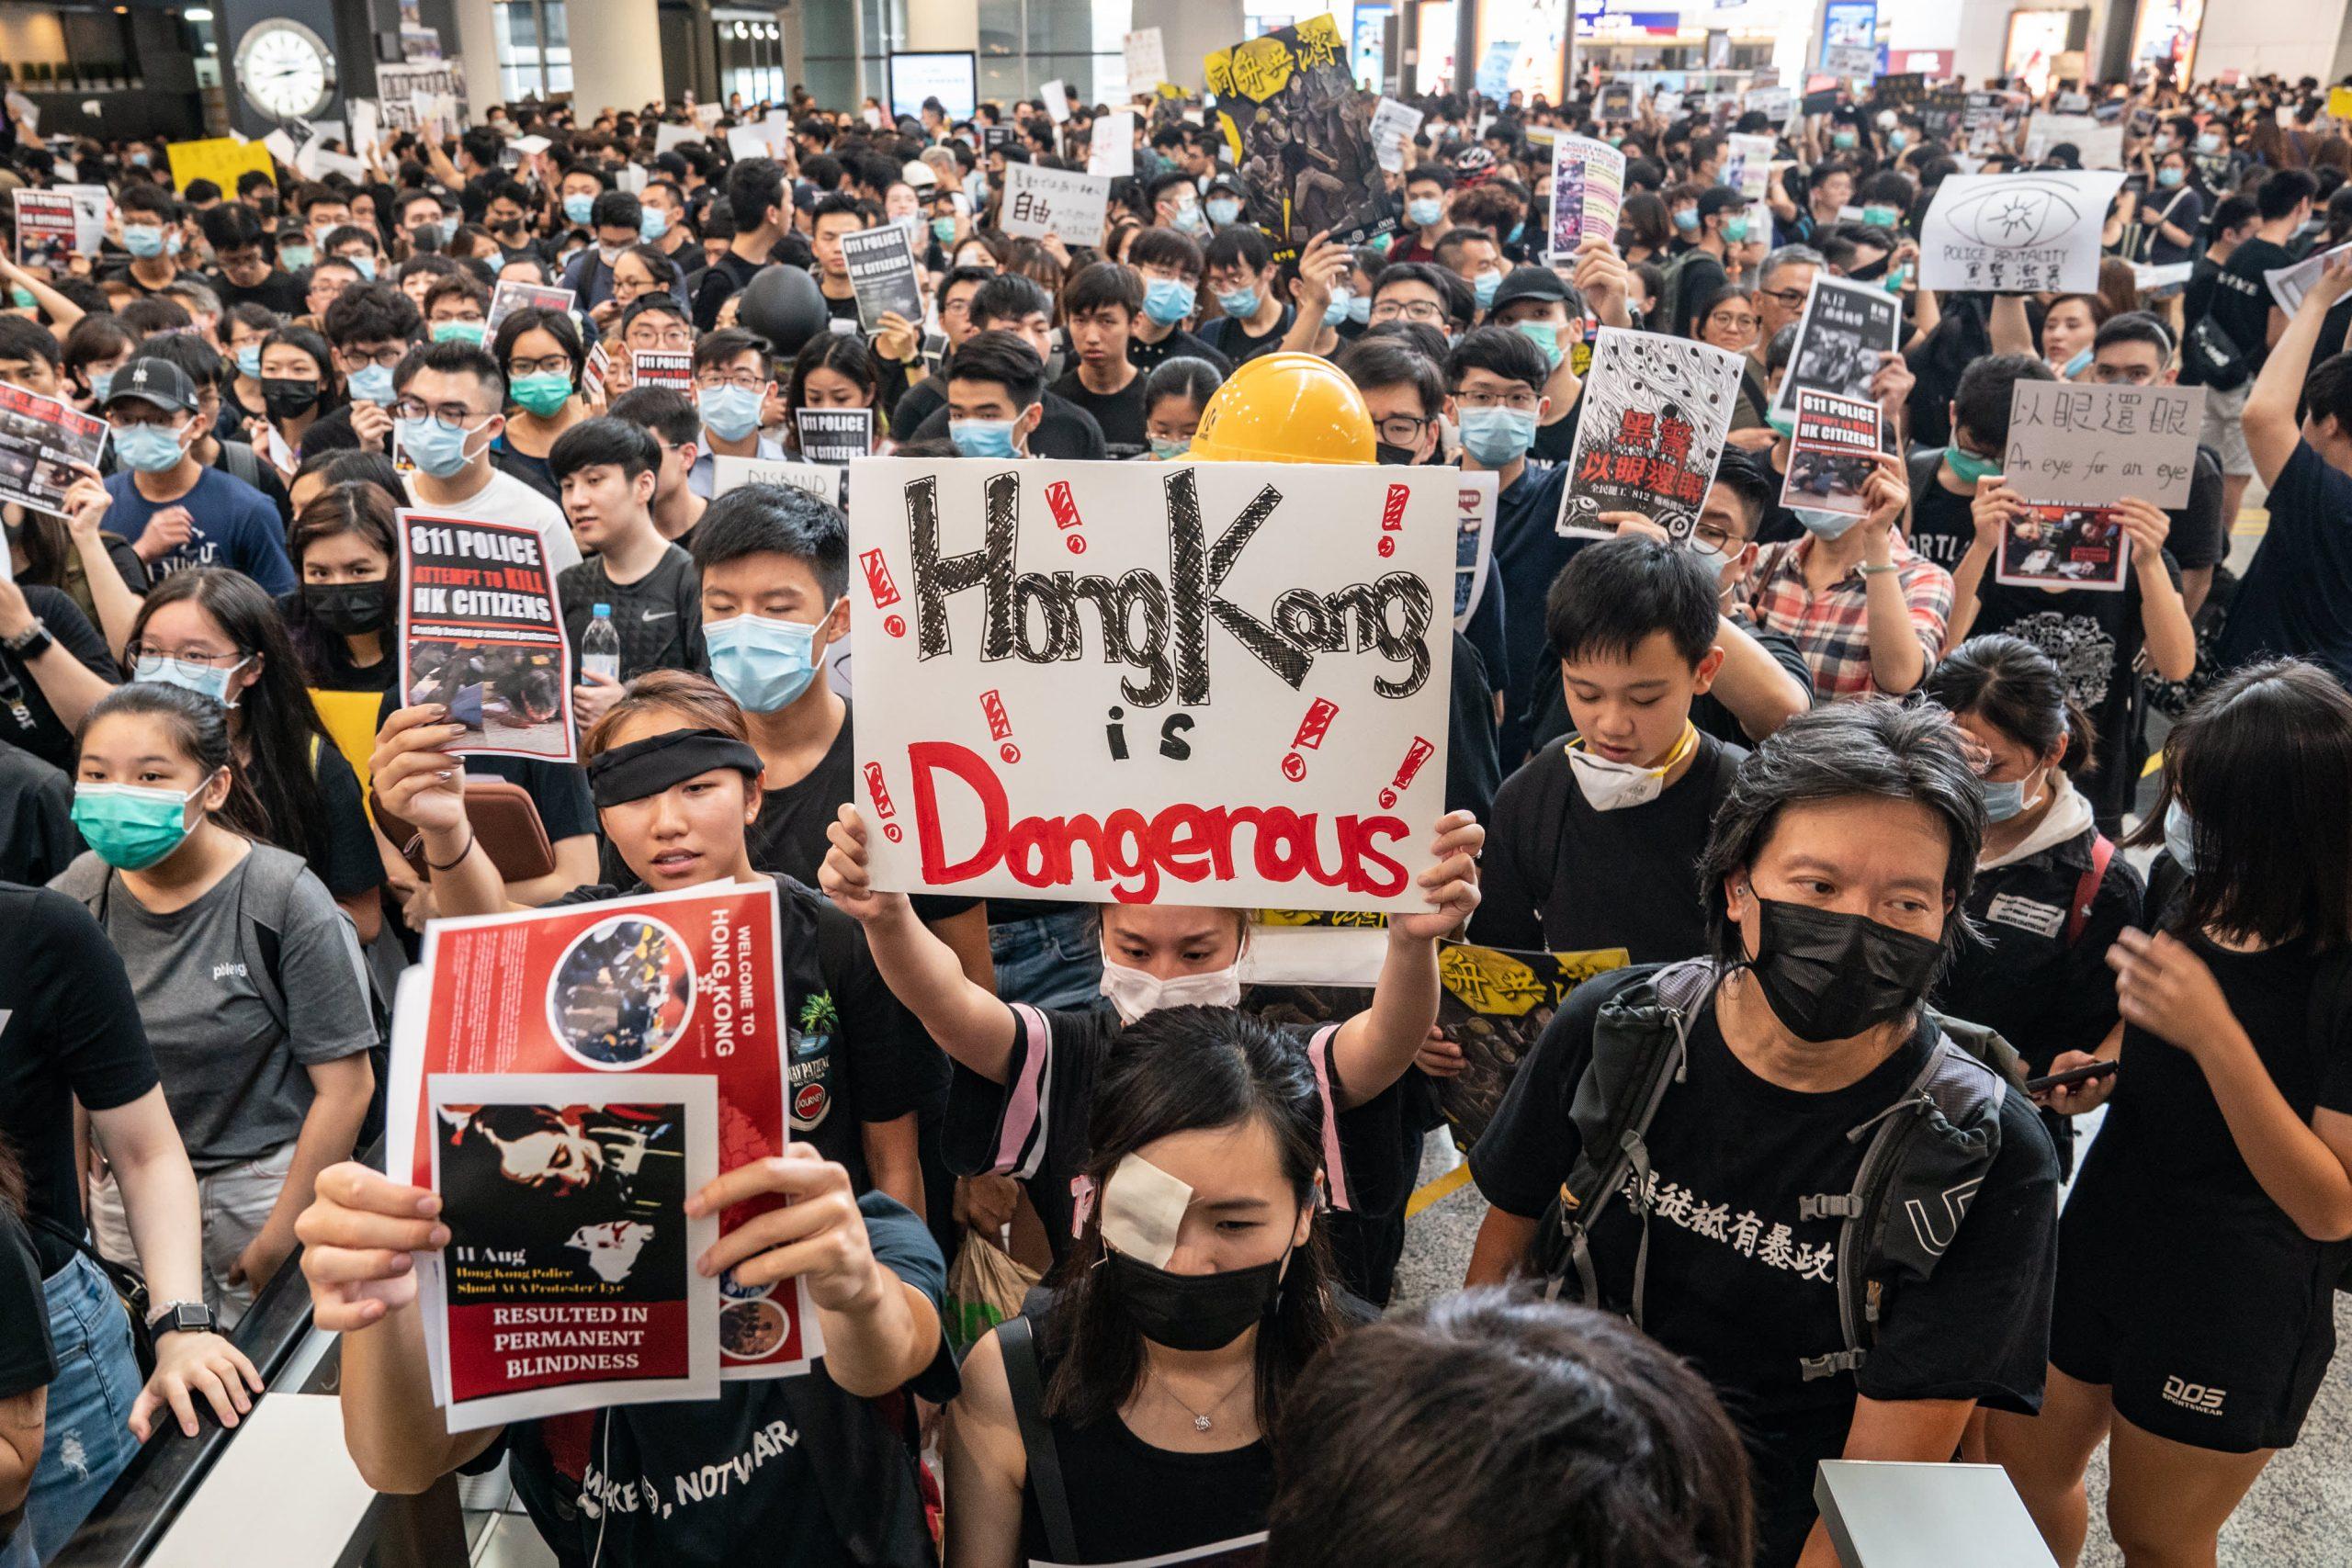 china-compares-u-s-capitol-riots-with-hong-kong-protests